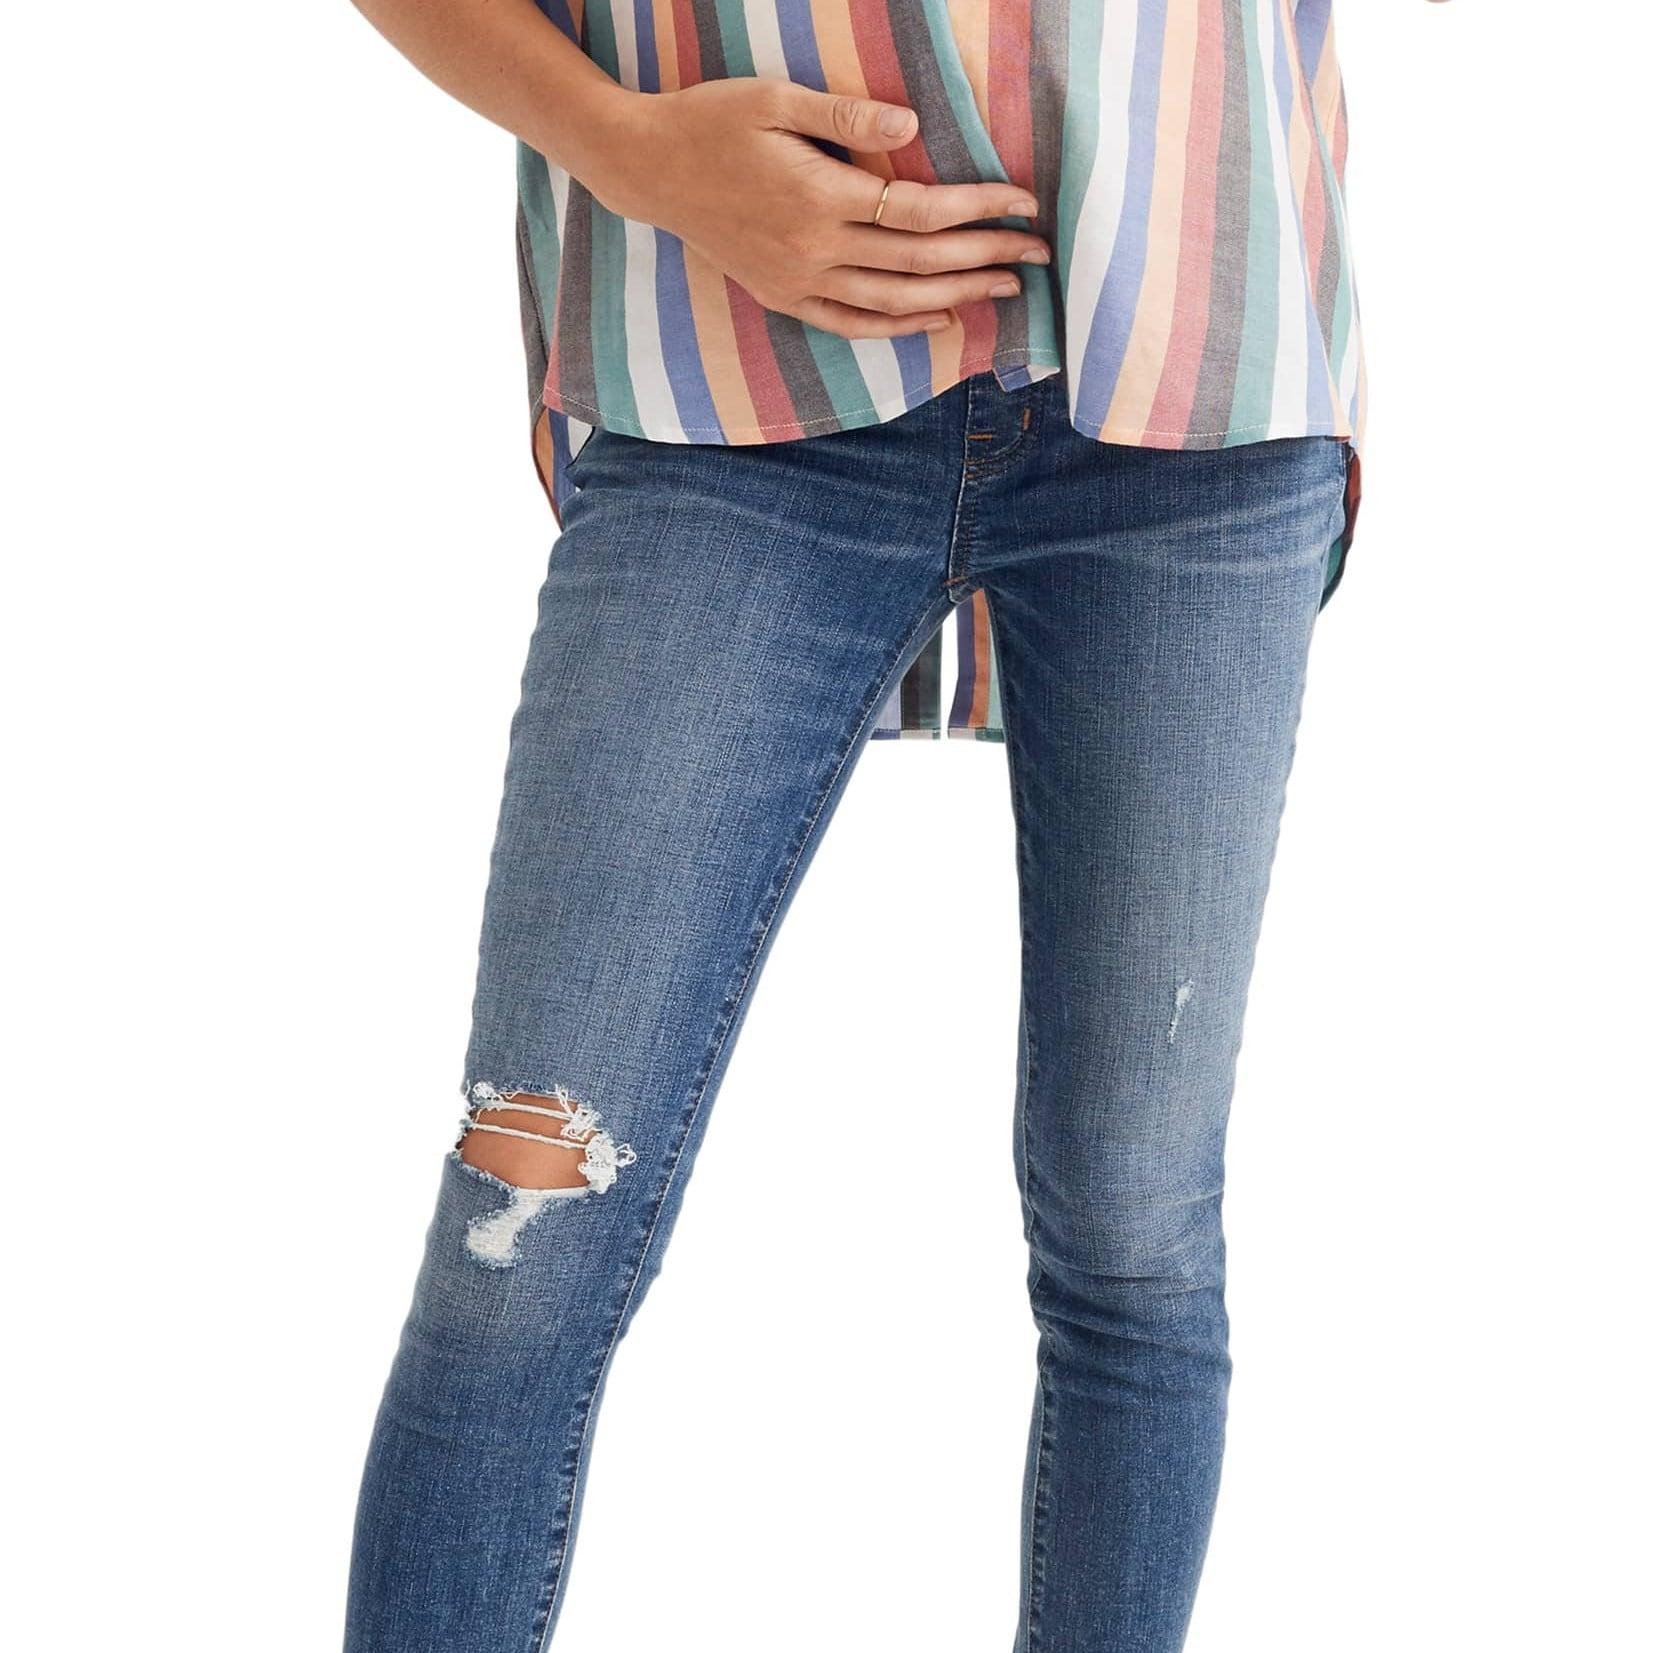 8e199f5b5b0 Best Maternity Jeans 2019